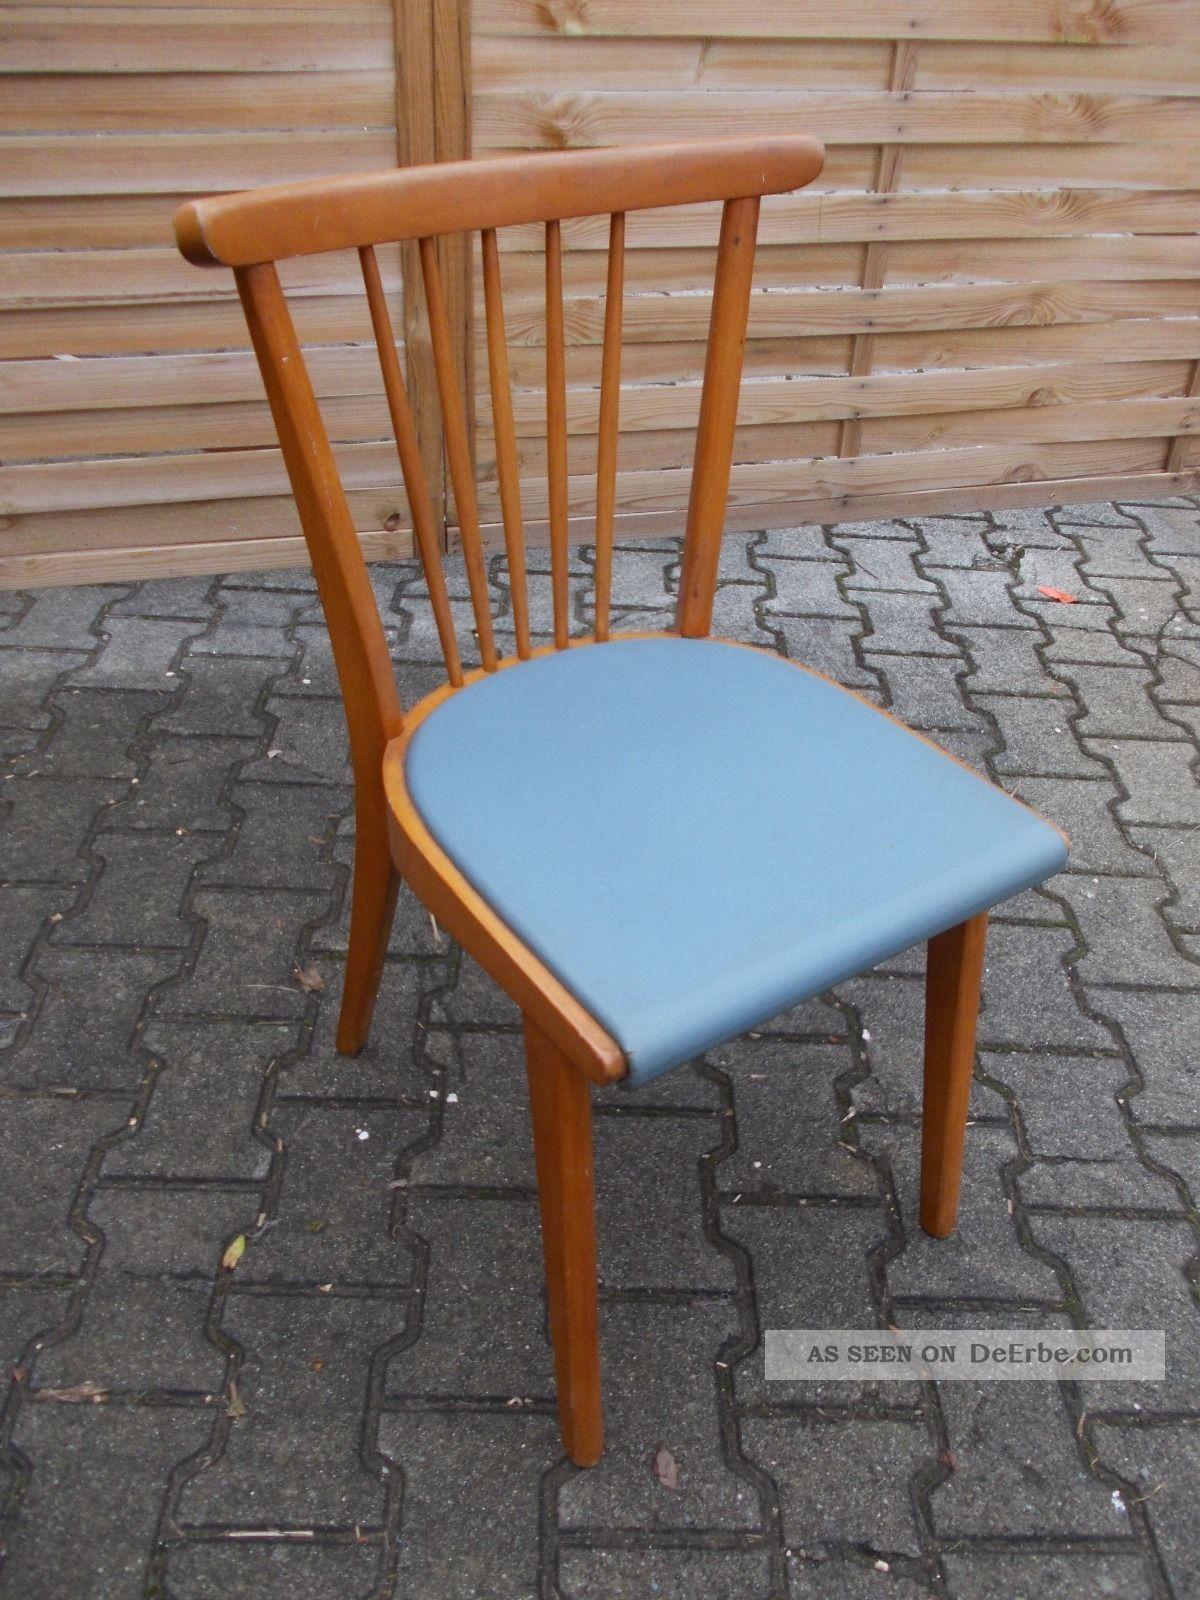 Alter Holz Stuhl, Alter Küchen Stuhl, 50er Jahre Stuhl